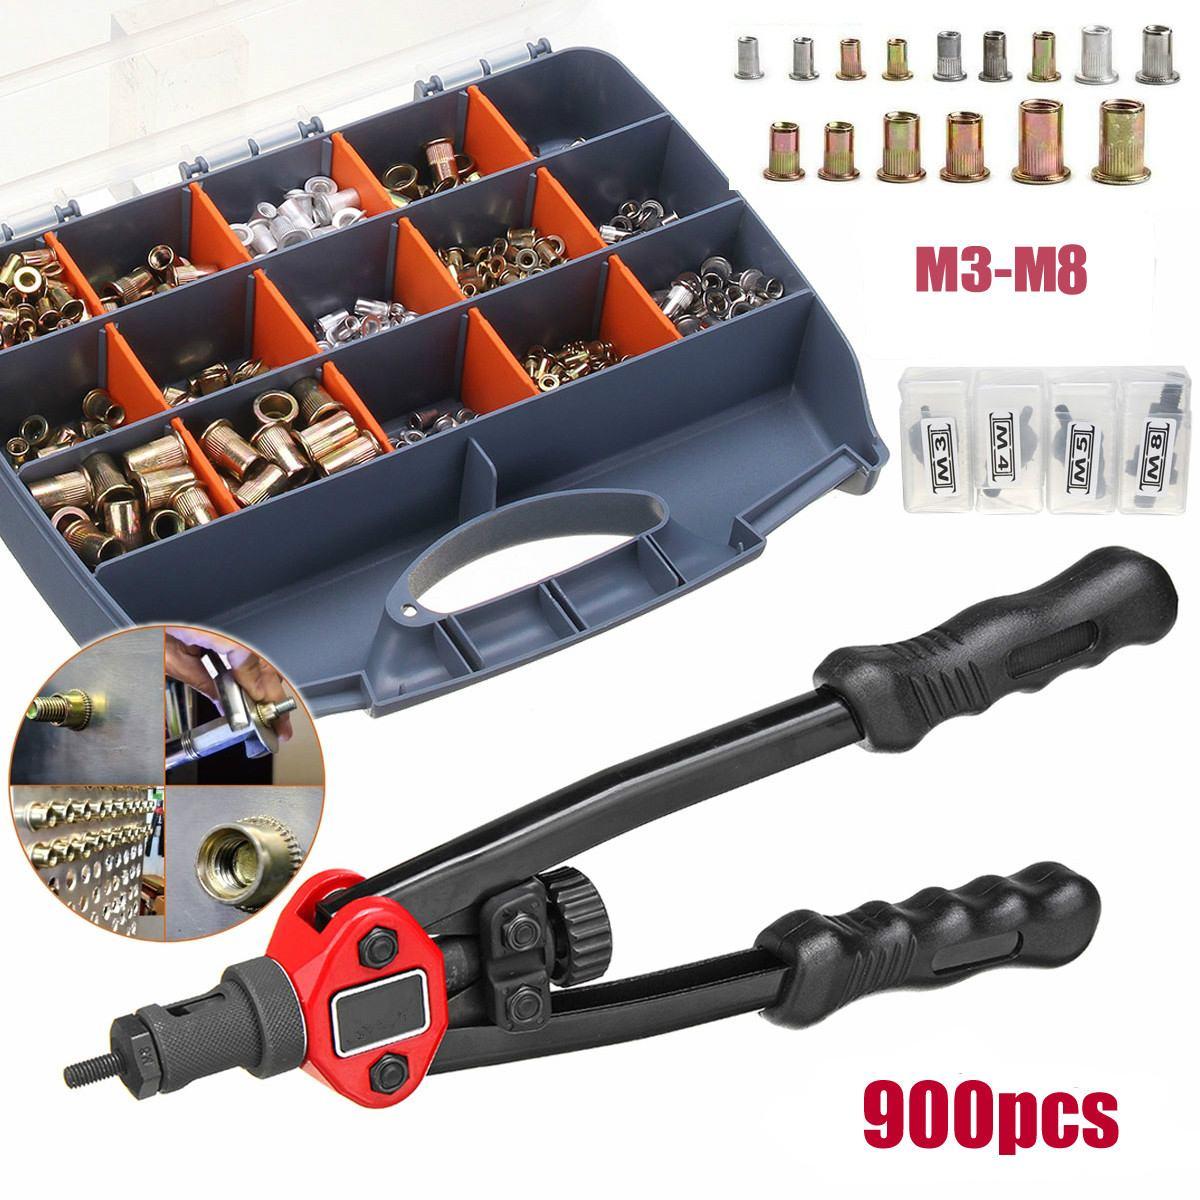 Hand Threaded Rivet Nuts Guns With Nuts 605 606 Double Insert Manual Riveter Riveting Rivnut Tool For M3/M4/M5/M6/M8/M10/M12 Nut